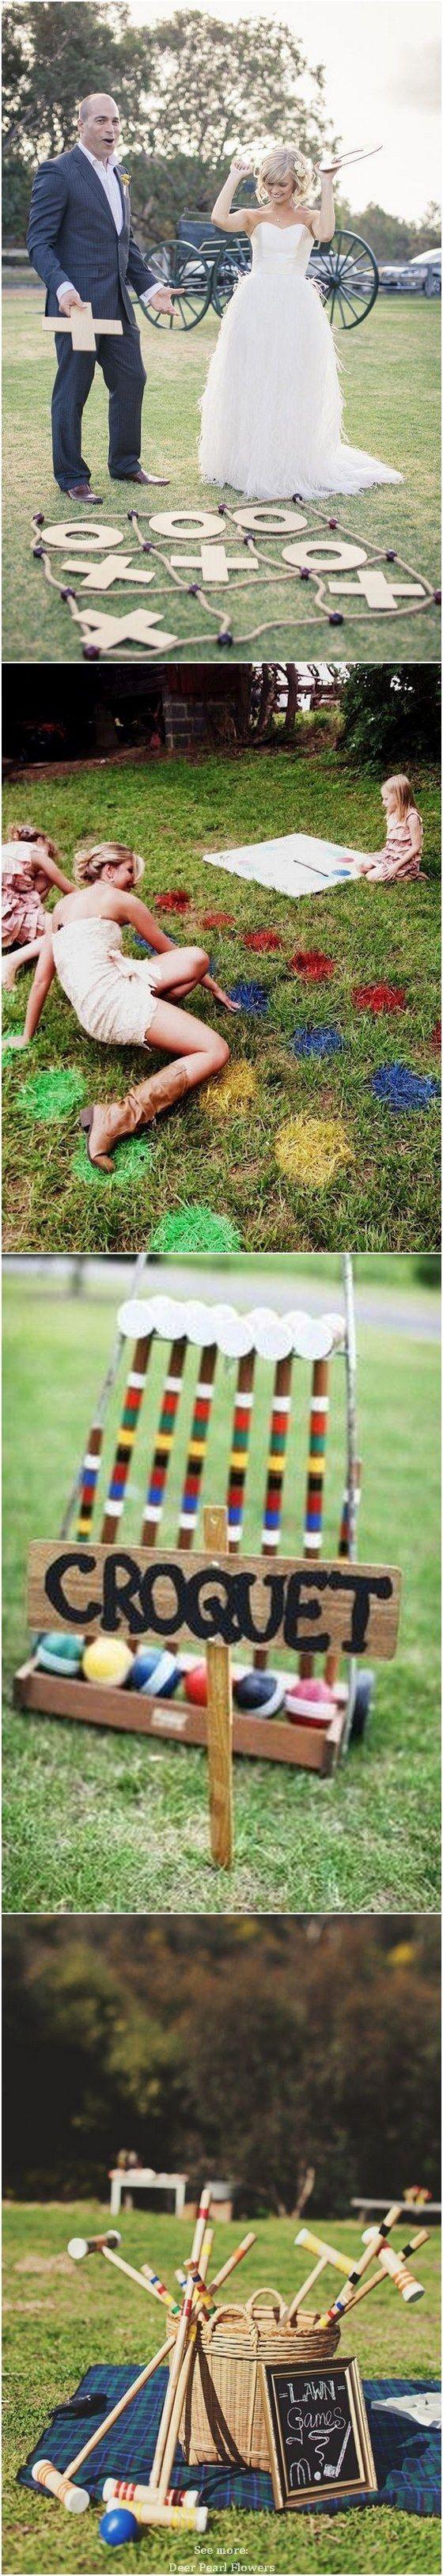 45 Fun Outdoor Wedding Reception Lawn Game Ideas Lawn Games Reception And Wedding